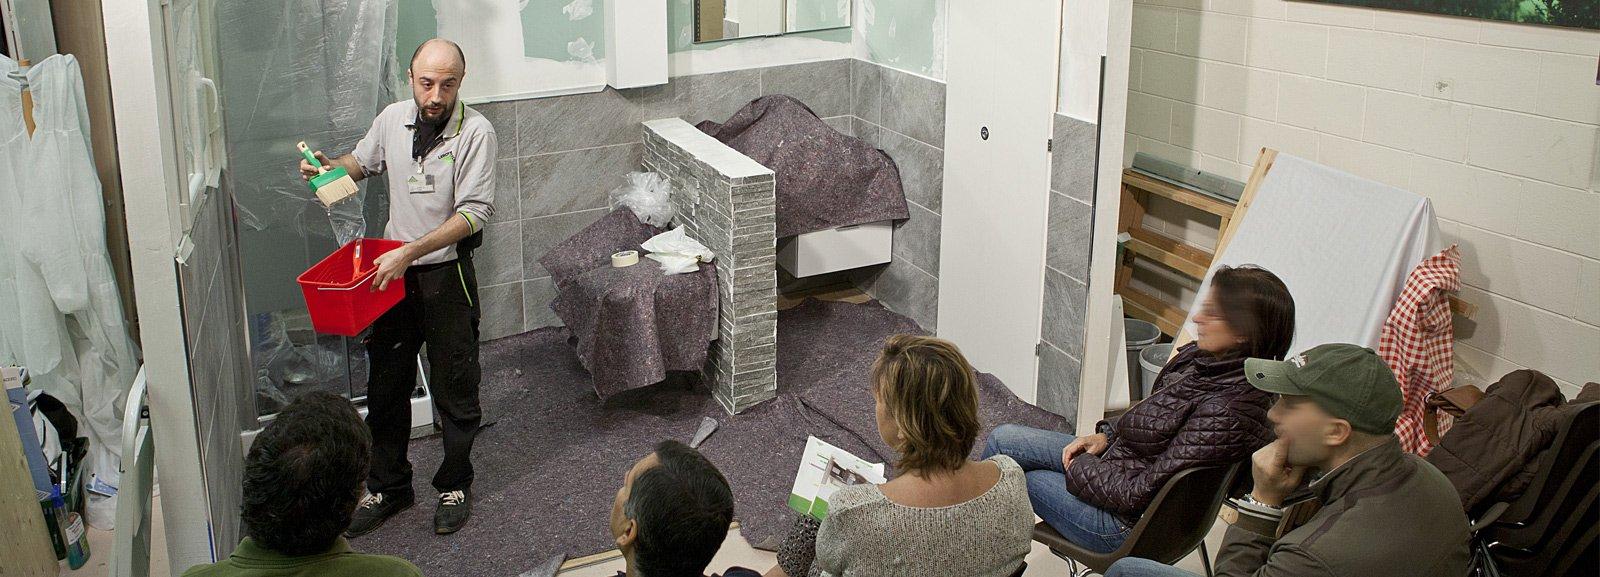 Bagno piccole riparazioni fai da te cose di casa - Bagno di vapore lezaeta fai da te ...